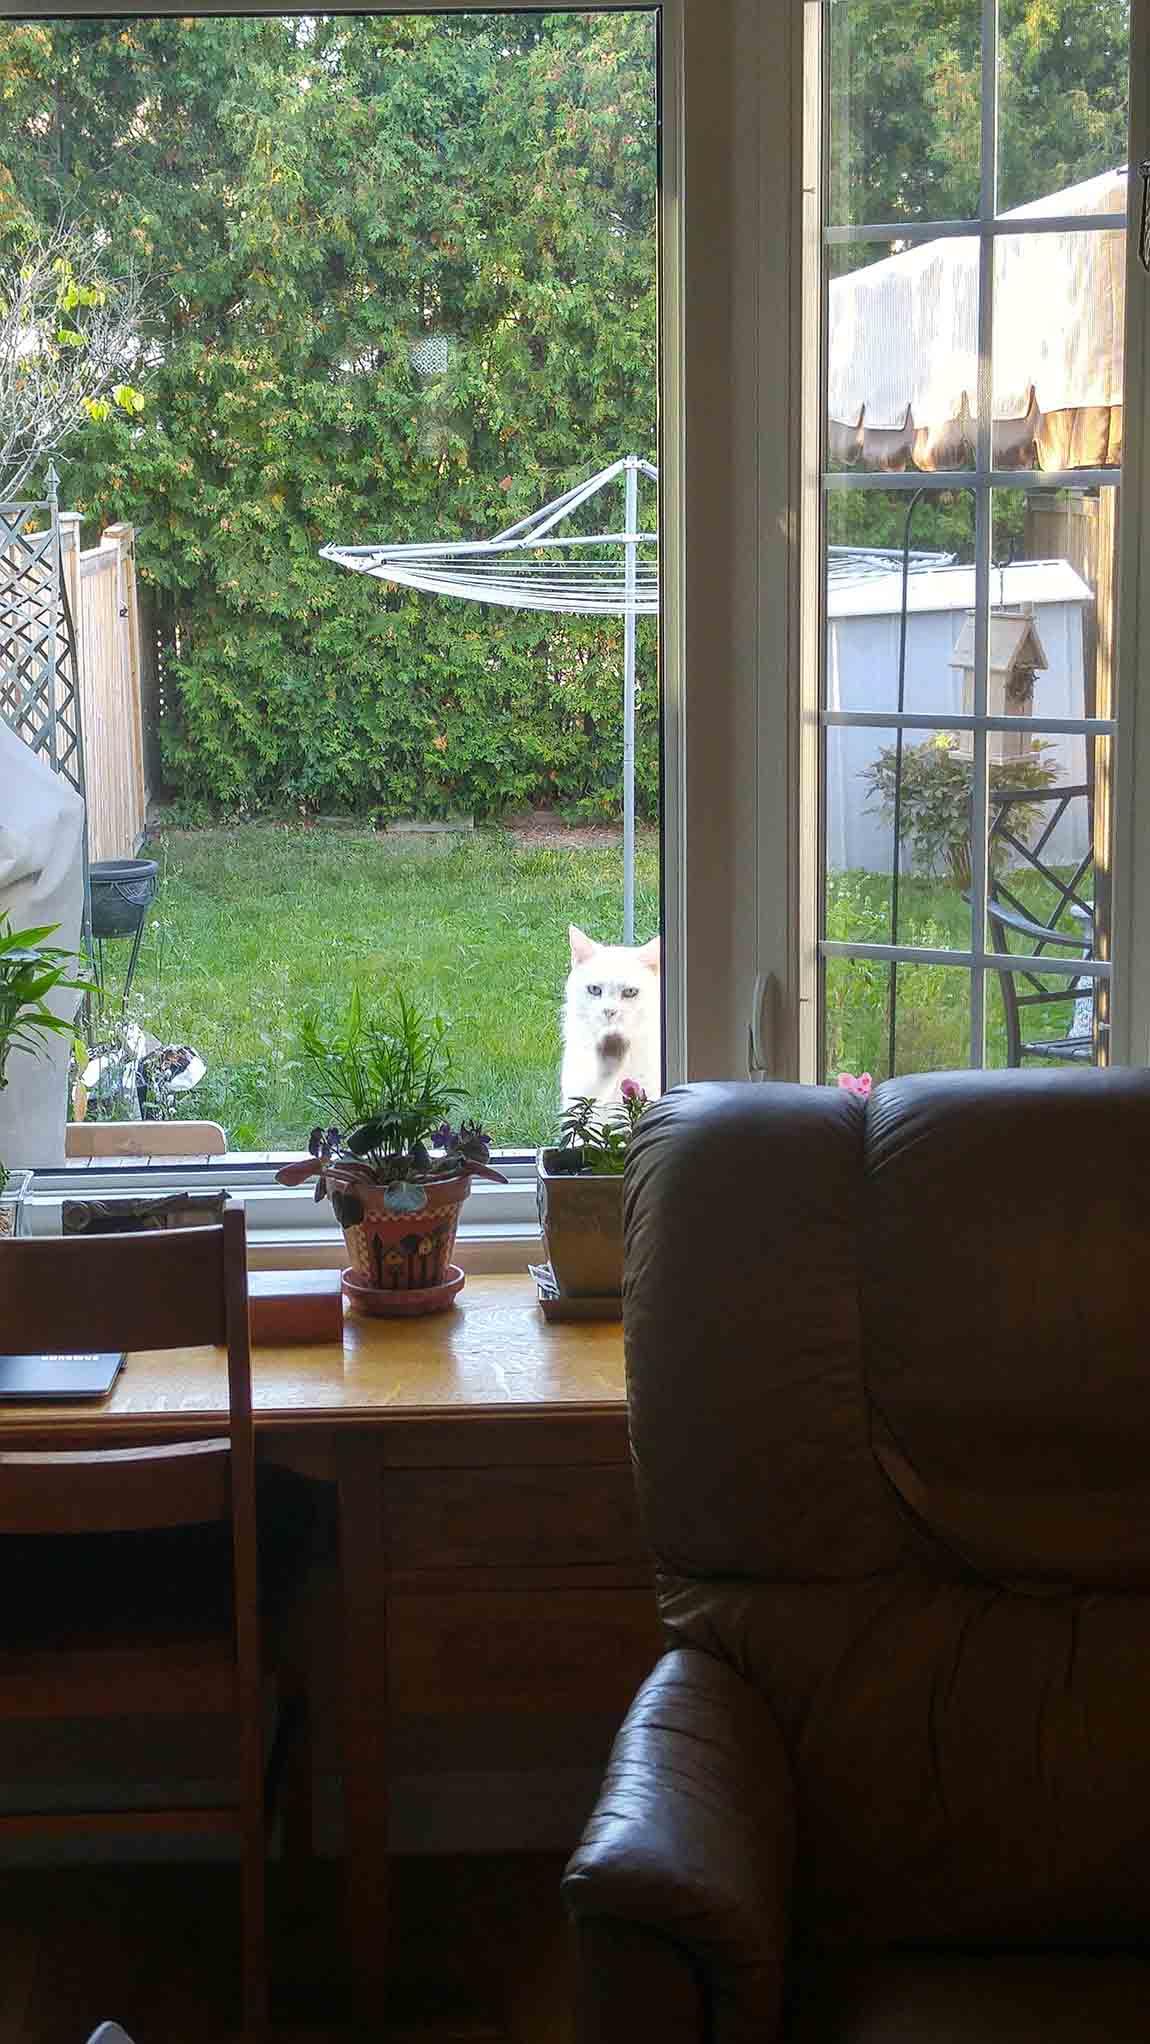 Gatito a través de la ventana